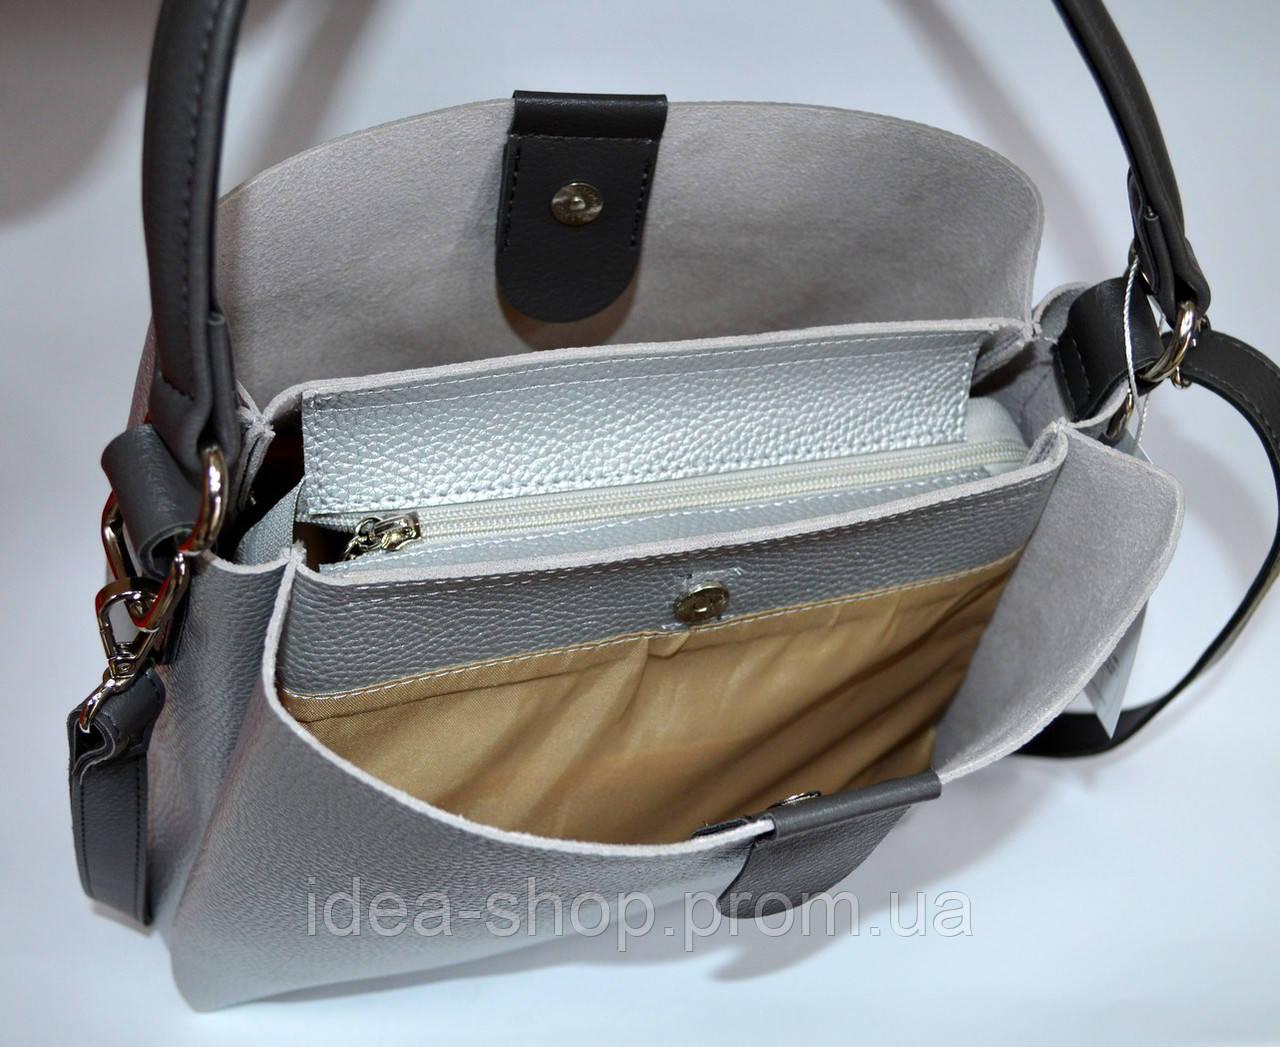 be95e07c760a Стильная сумка шоппер цвет серебро производство украина, цена 595 грн.,  купить в Харькове — Prom.ua (ID#694192148)